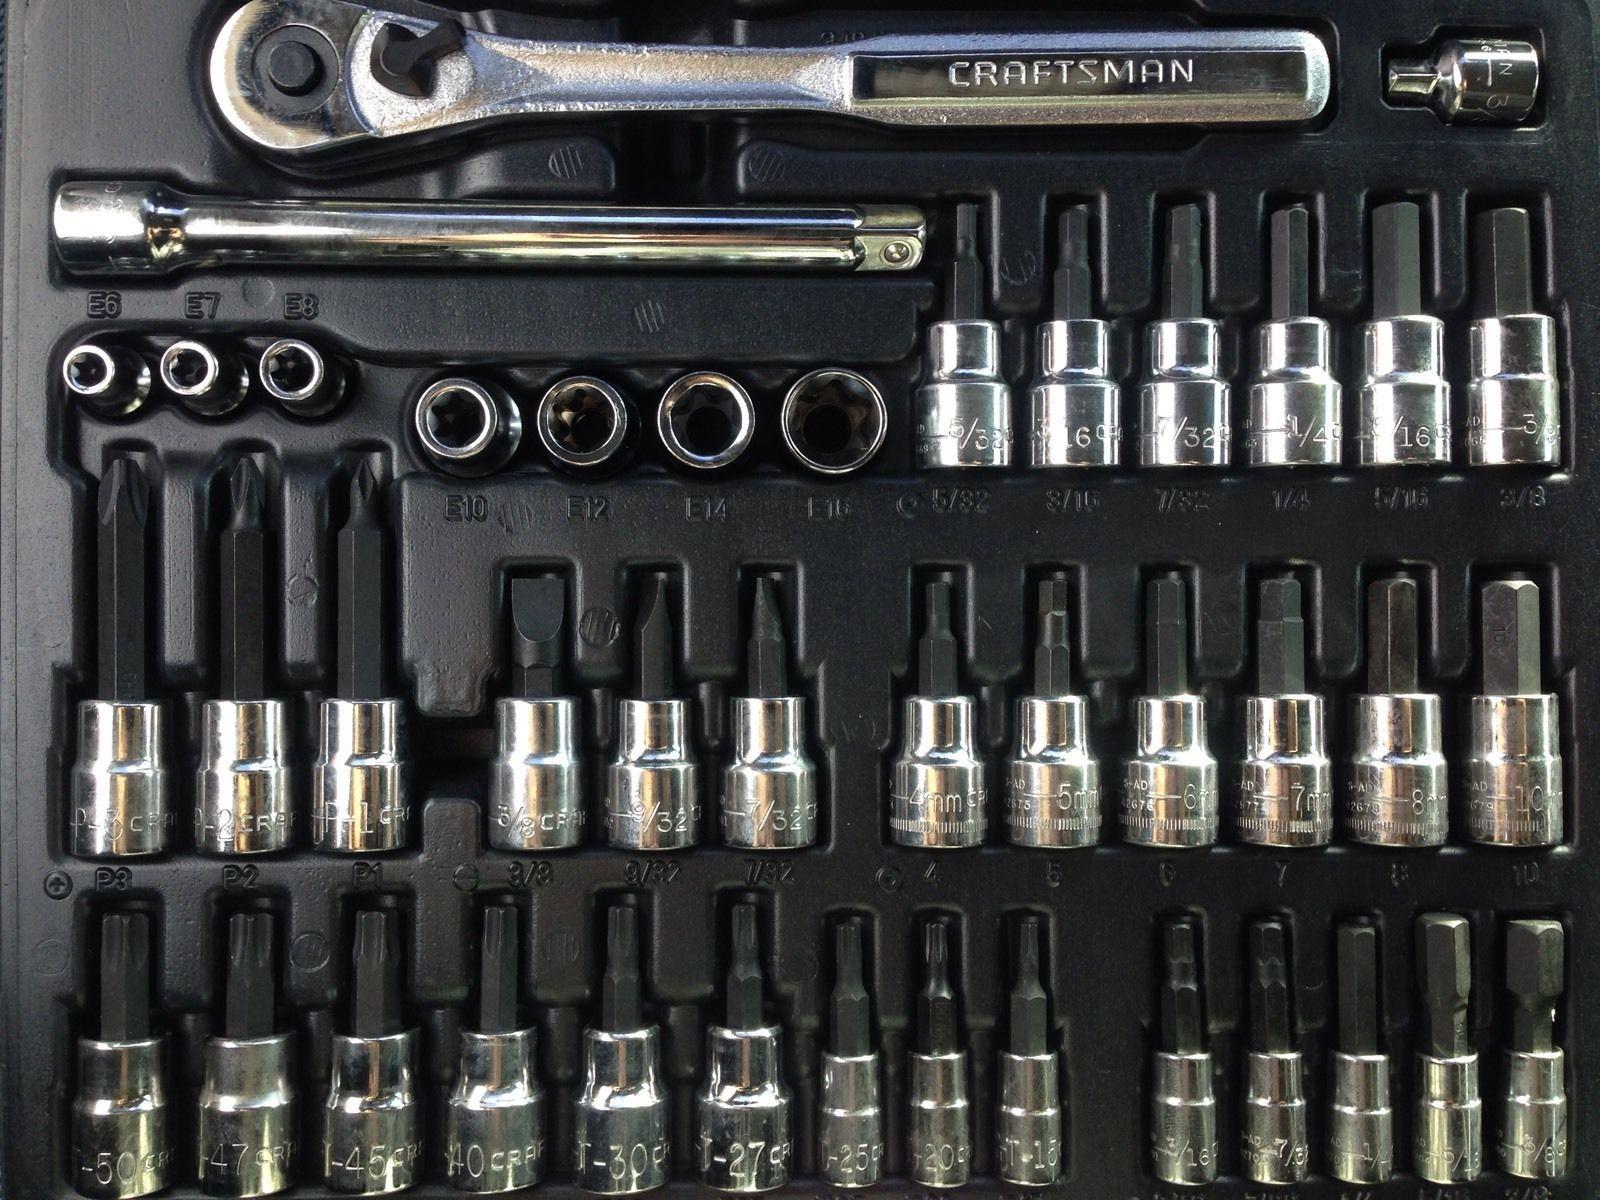 New Craftsman 42 PC Socket Wrench Set Ratchet Extension Hex Torx Screwdriver | eBay